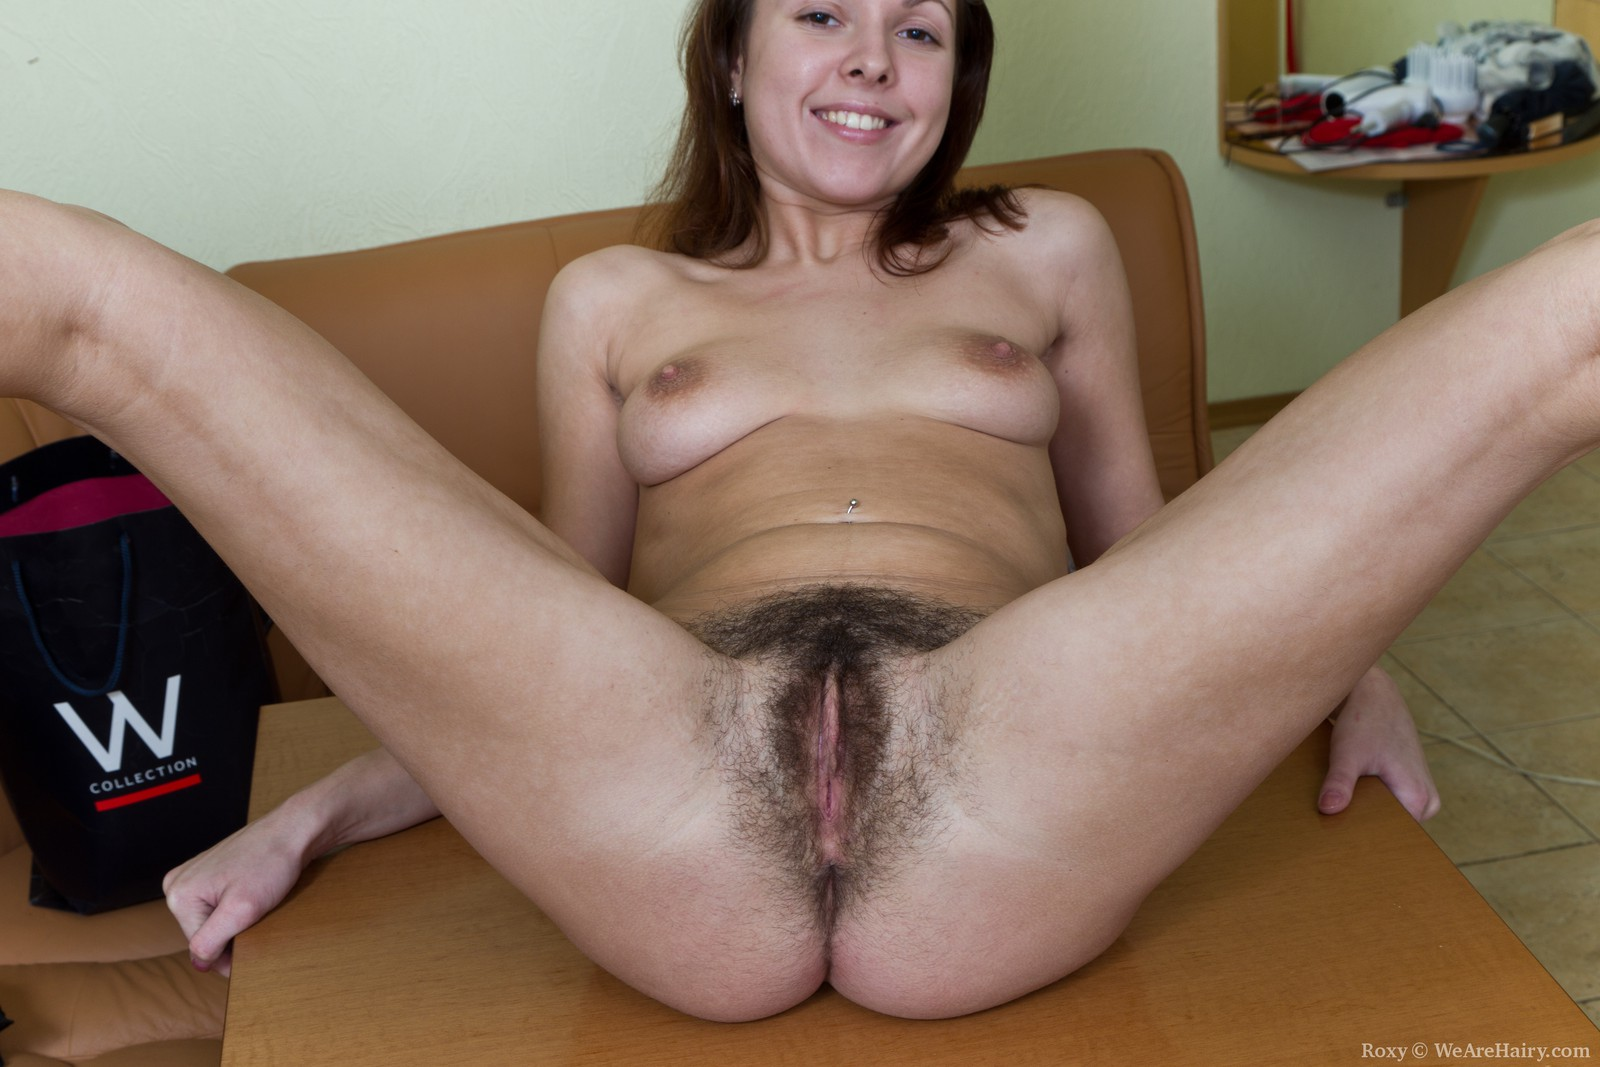 ... porn - retro hairy beaver, swedish hairy pussy @ Hairy Naked Girls